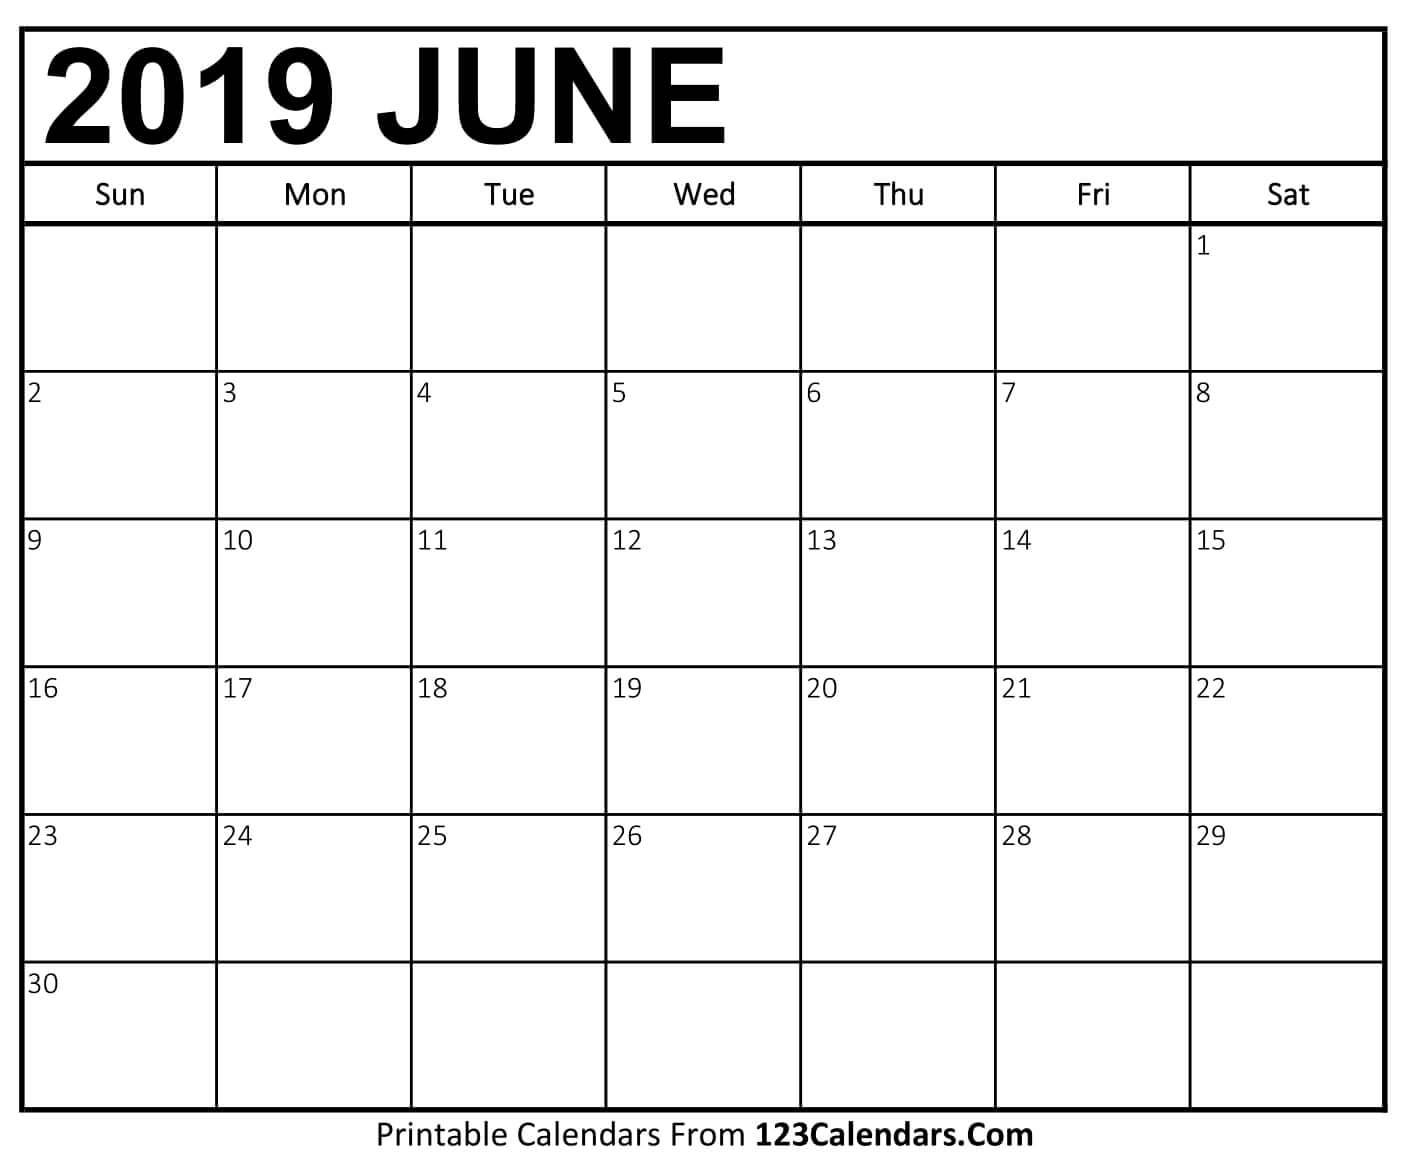 Free June Calendar 2019 Page